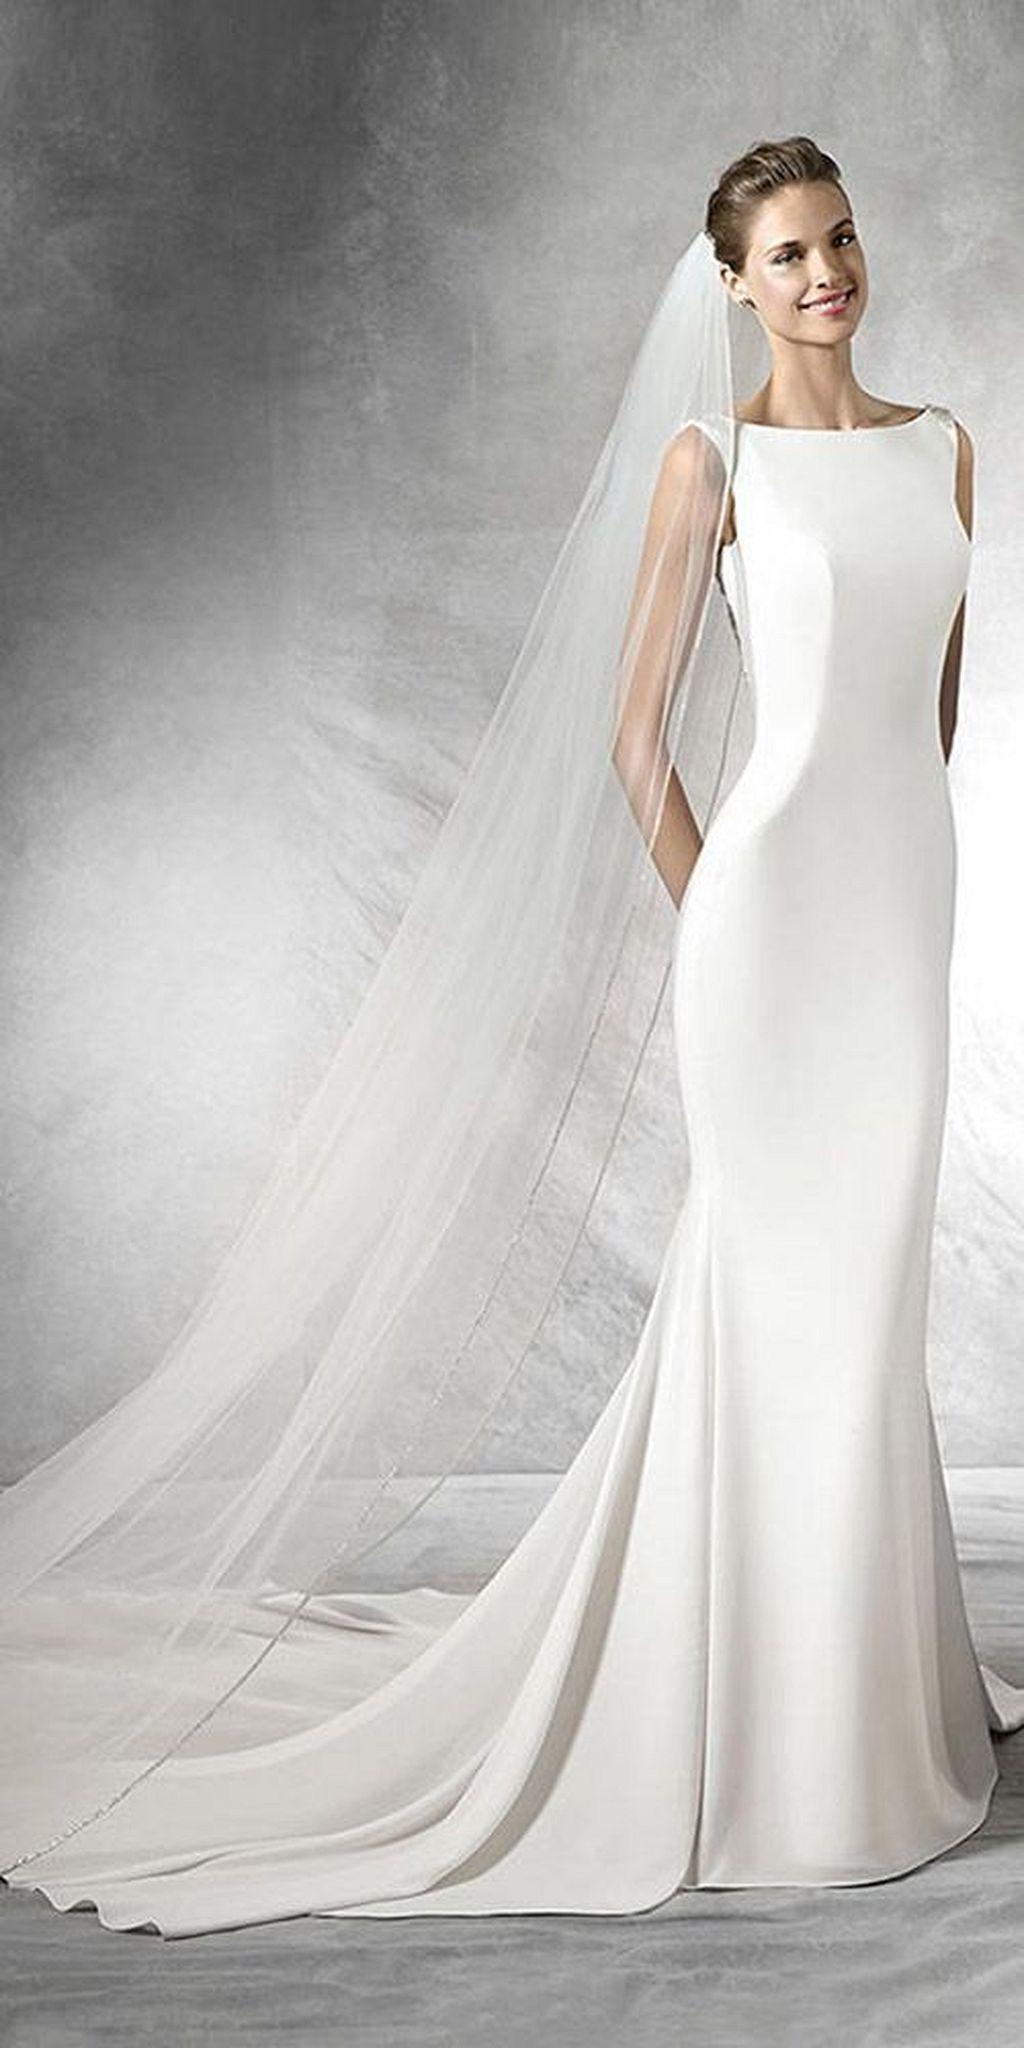 Gorgeous dress for wedding party   Gorgeous Classic Wedding Dress  Classic weddings Dress attire